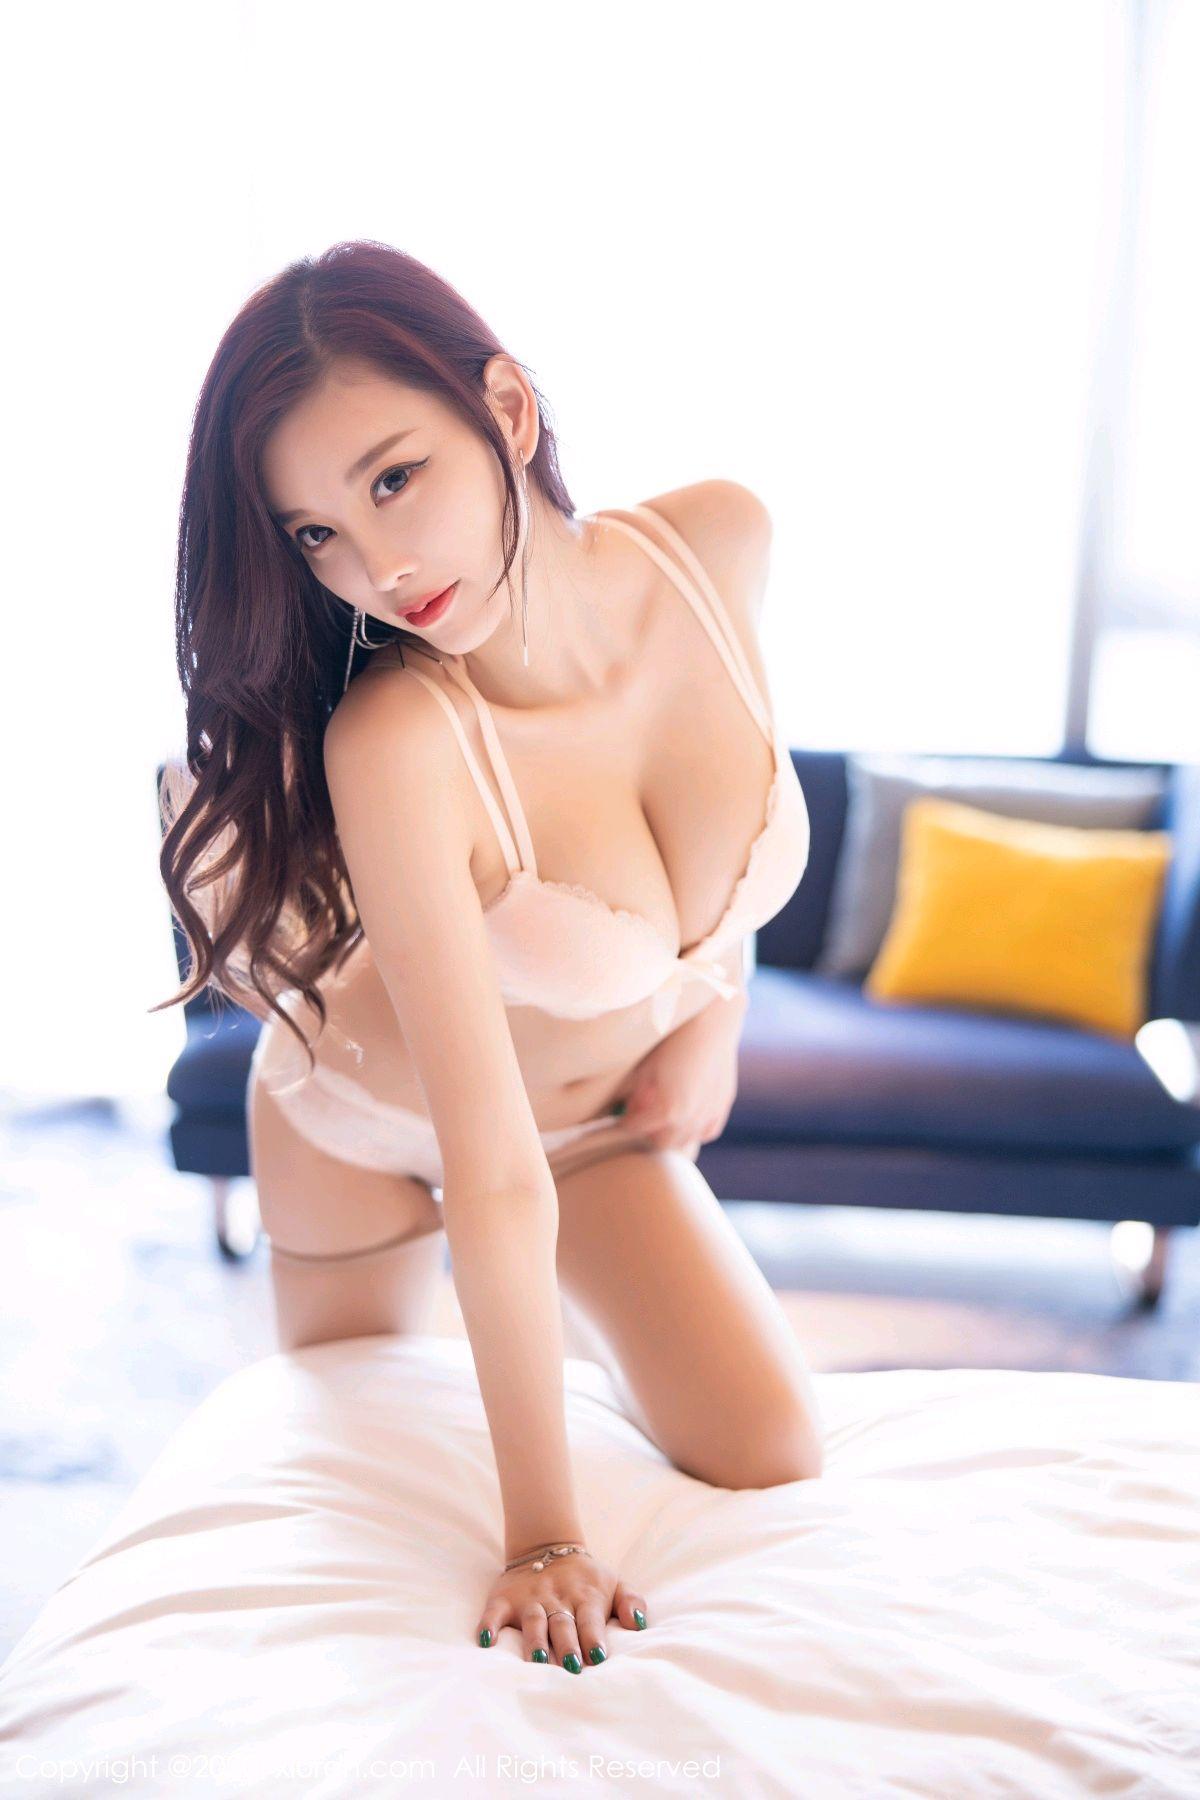 [XiuRen] Vol.2431 Yang Chen Chen 70P, Tall, Underwear, Uniform, Xiuren, Yang Chen Chen